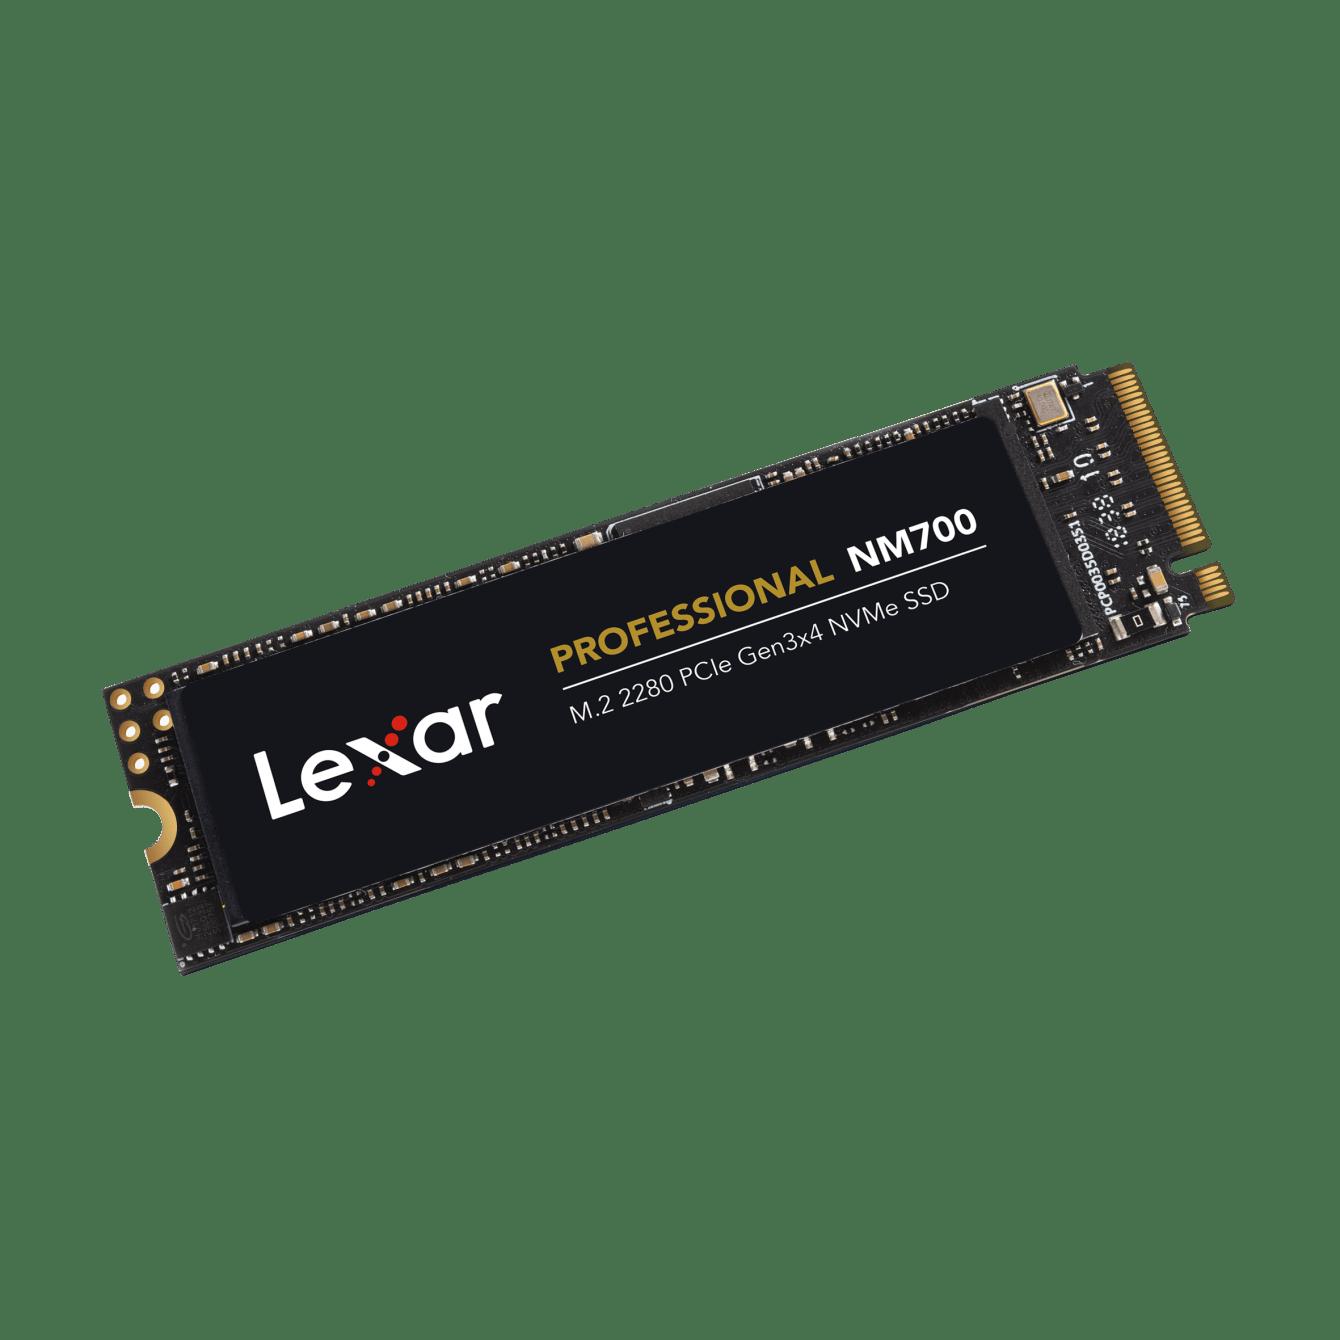 Lexar annuncia la nuova SSD Professional NM700 PCIe Gen3x4 NVMe